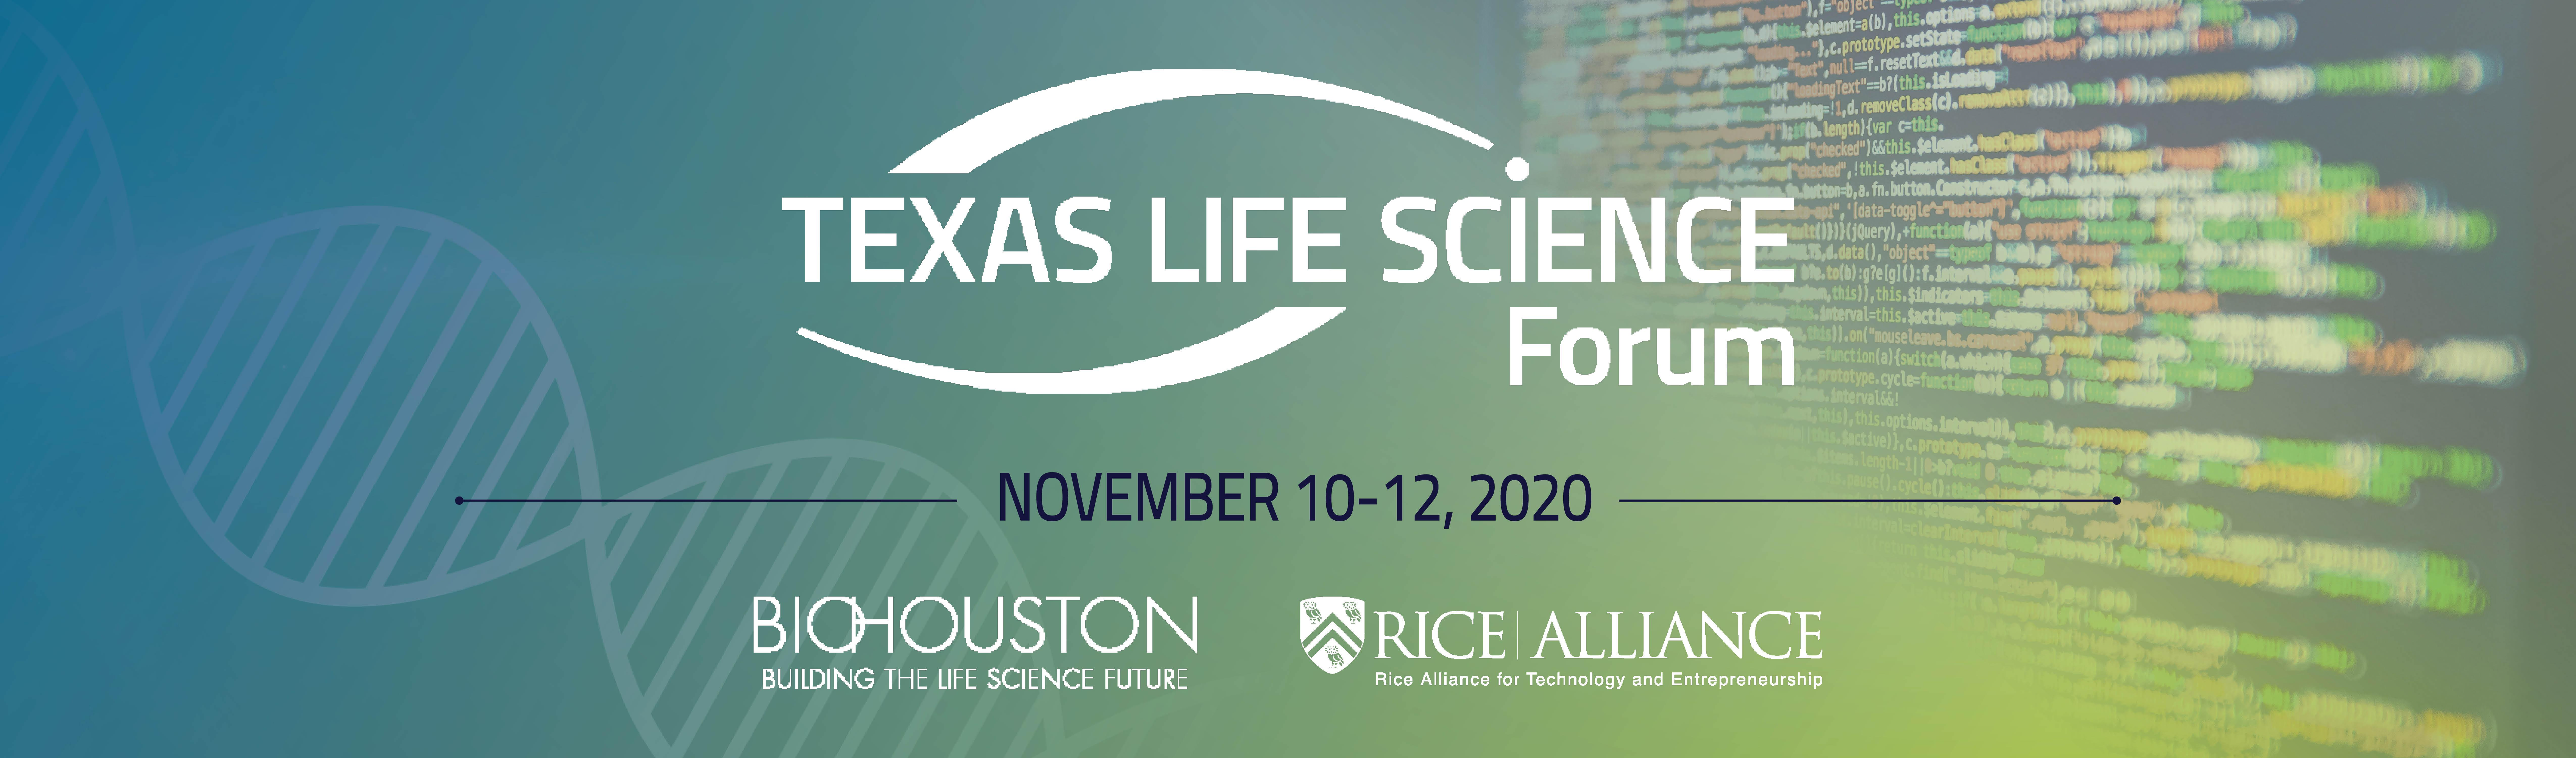 Texas Life Science Forum Logo, Nov 10-12, 2020